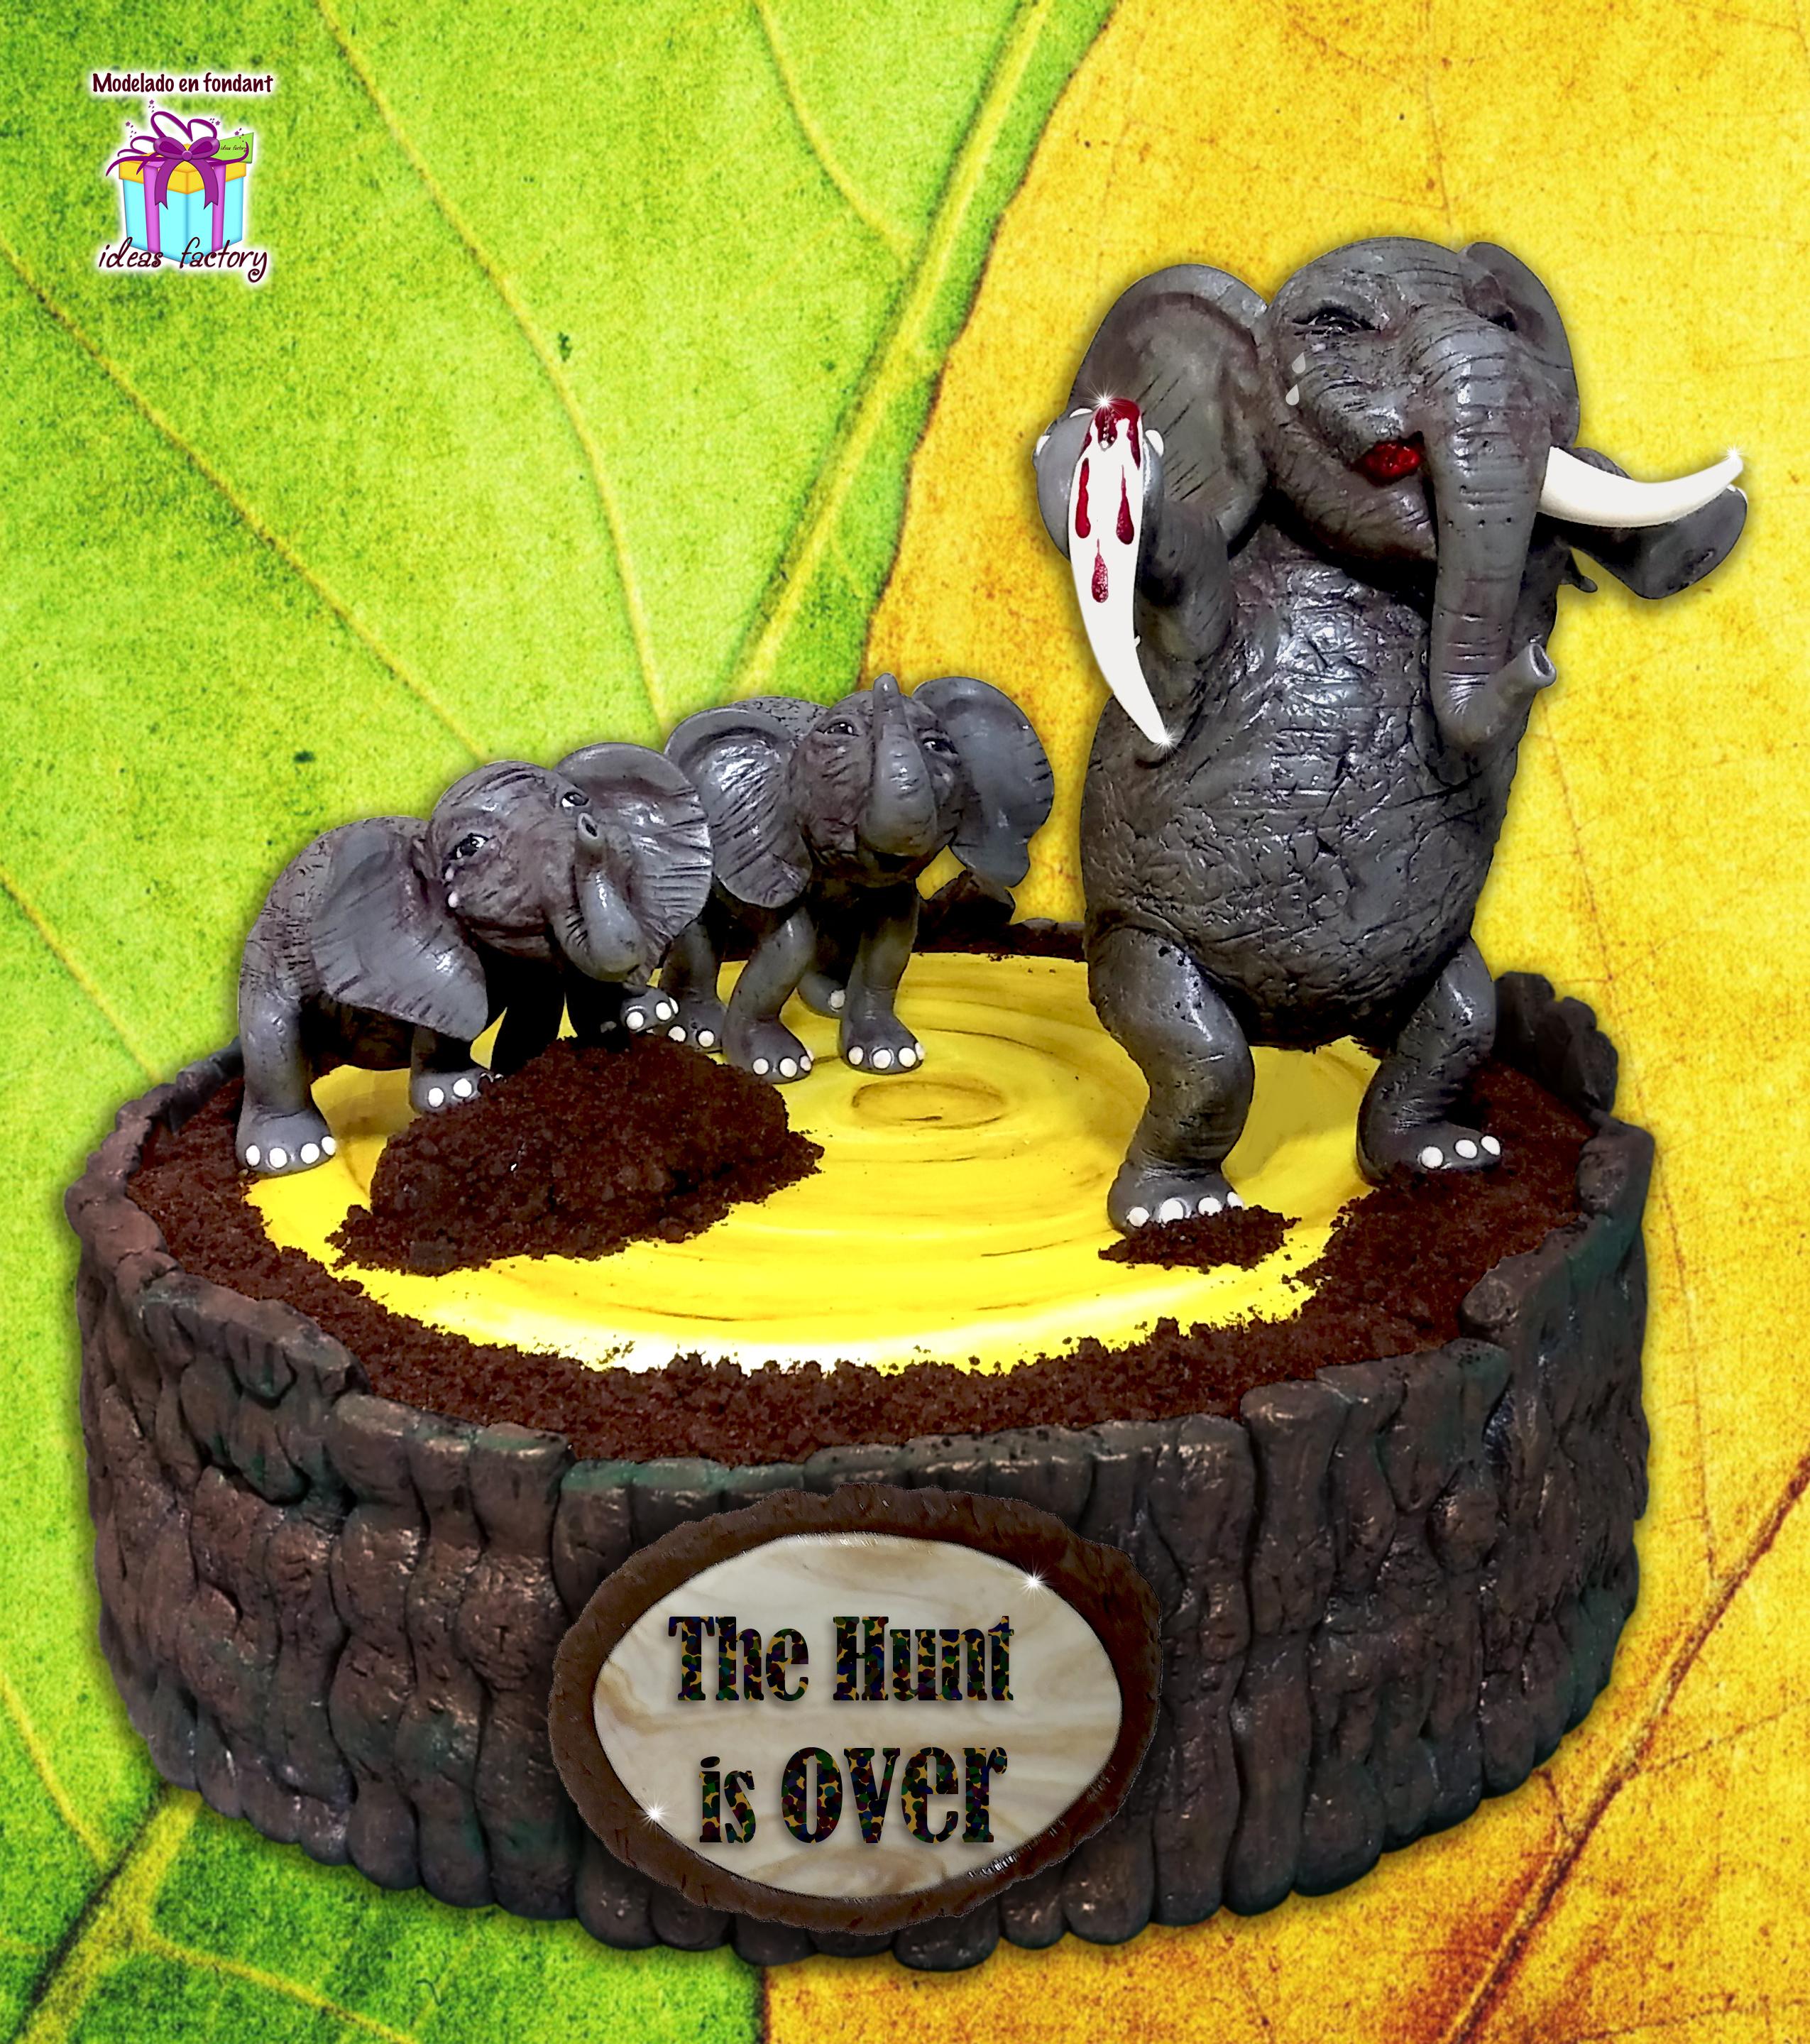 Animal-Rights-Raúl-Alberto-Díaz-Ideas-Facotry-Elephant.jpg#asset:13734